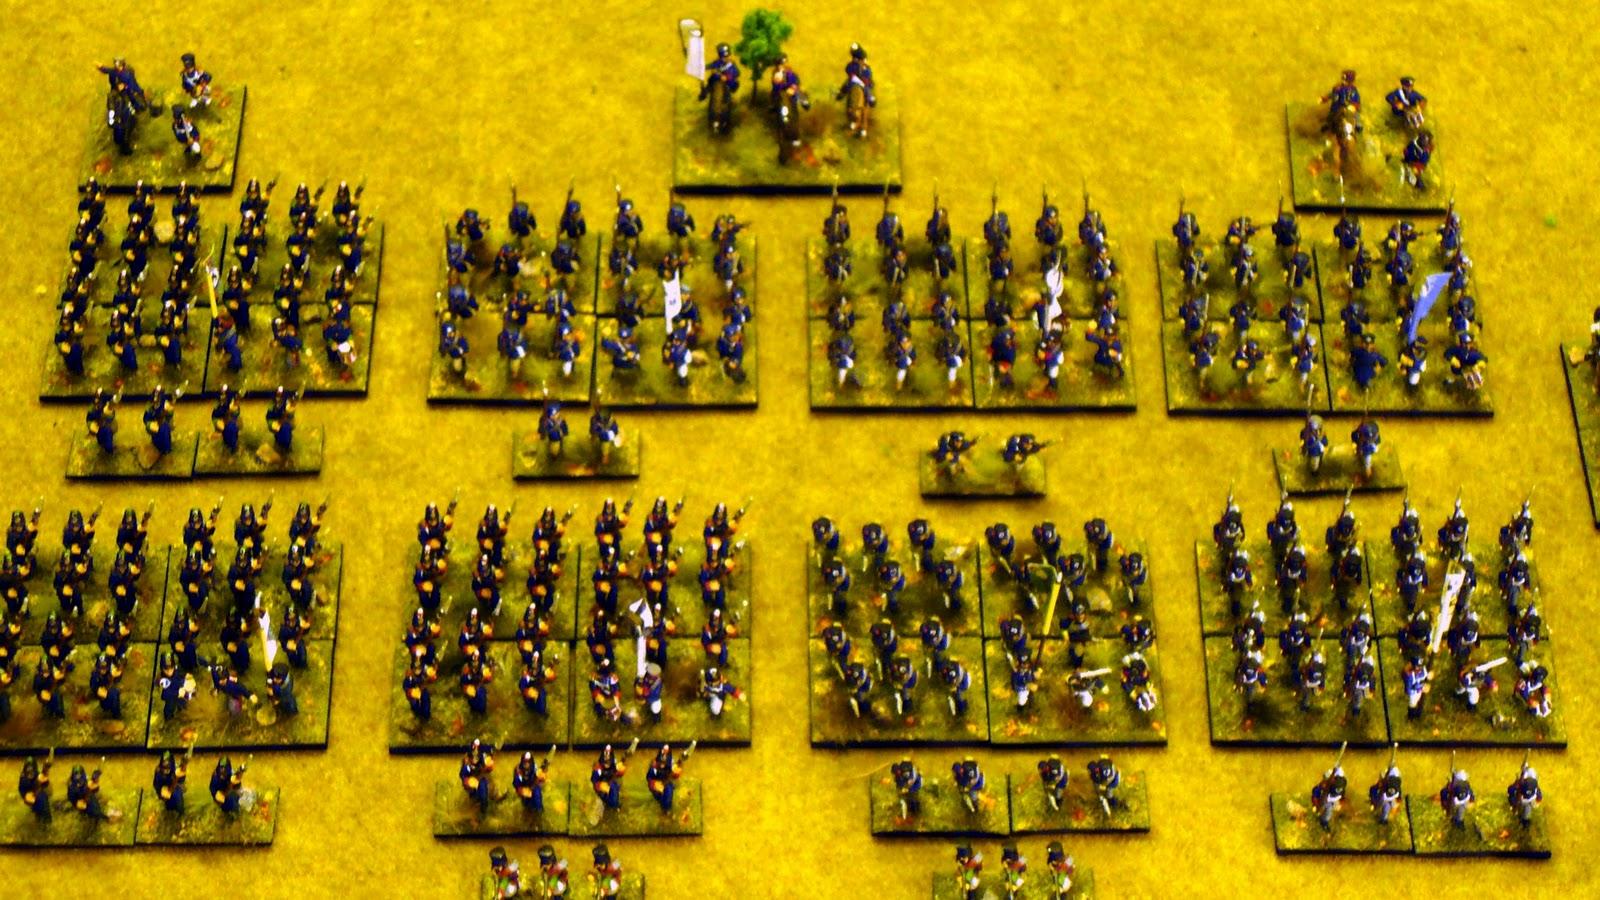 Sgt Steiner S Wargaming Blog Lasalle Prussians On Parade